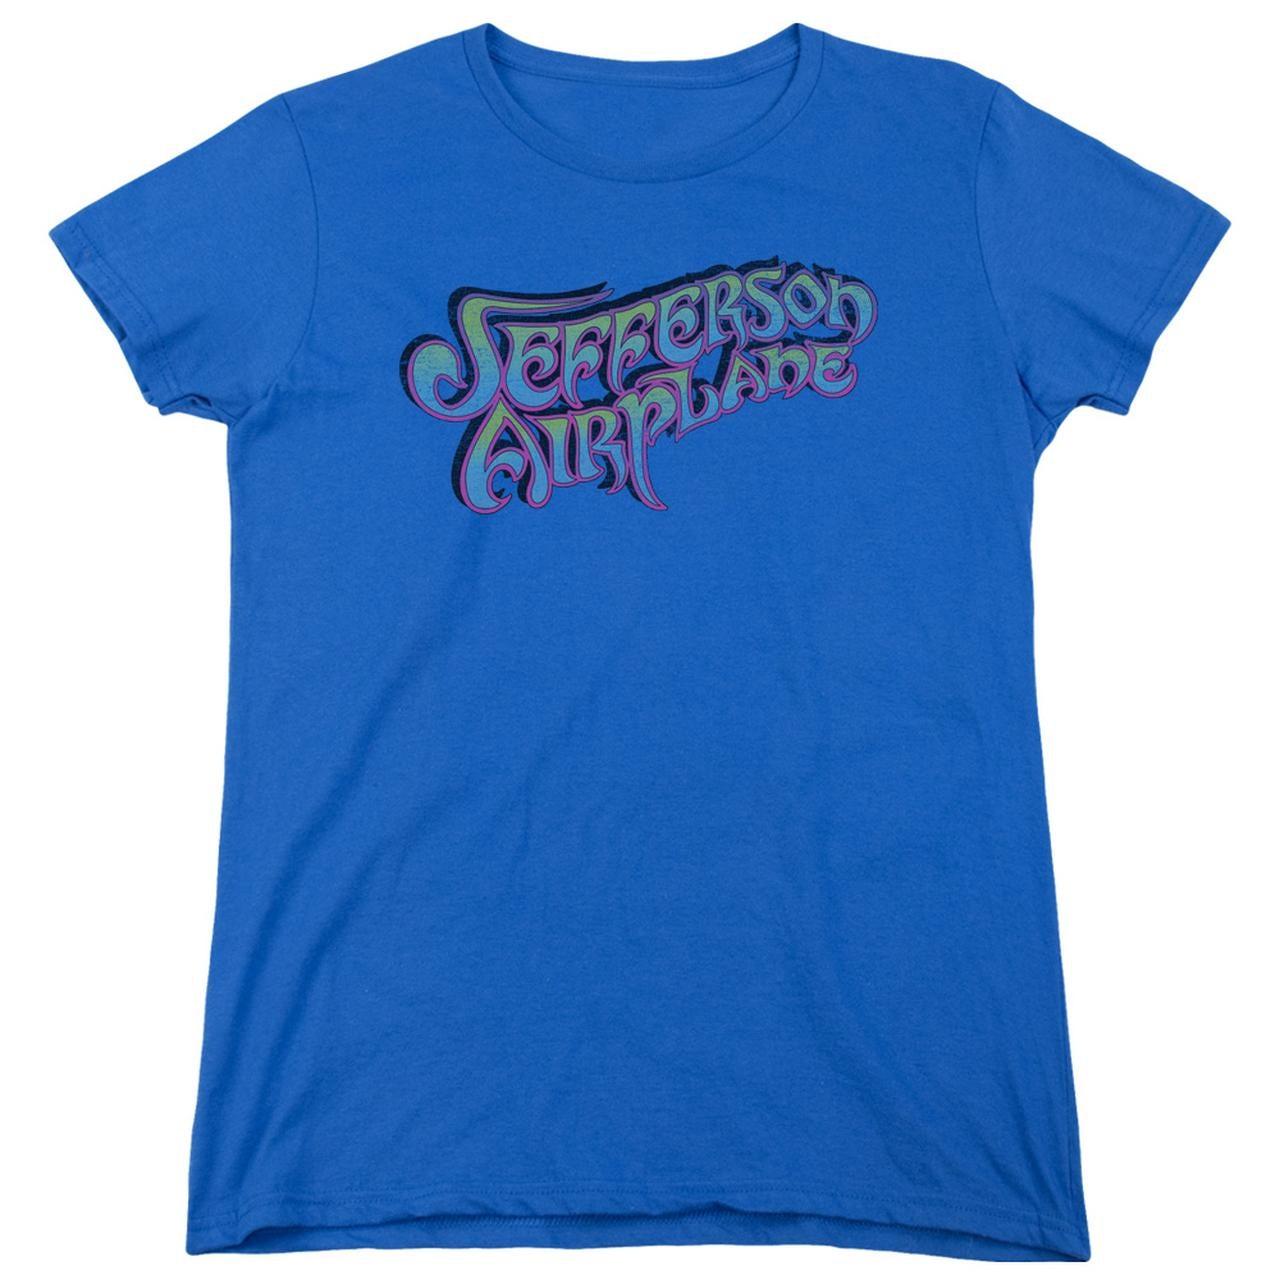 ea87c48563 Jefferson Airplane Women's Shirt   GRADIENT LOGO Ladies Tee. Touch to zoom